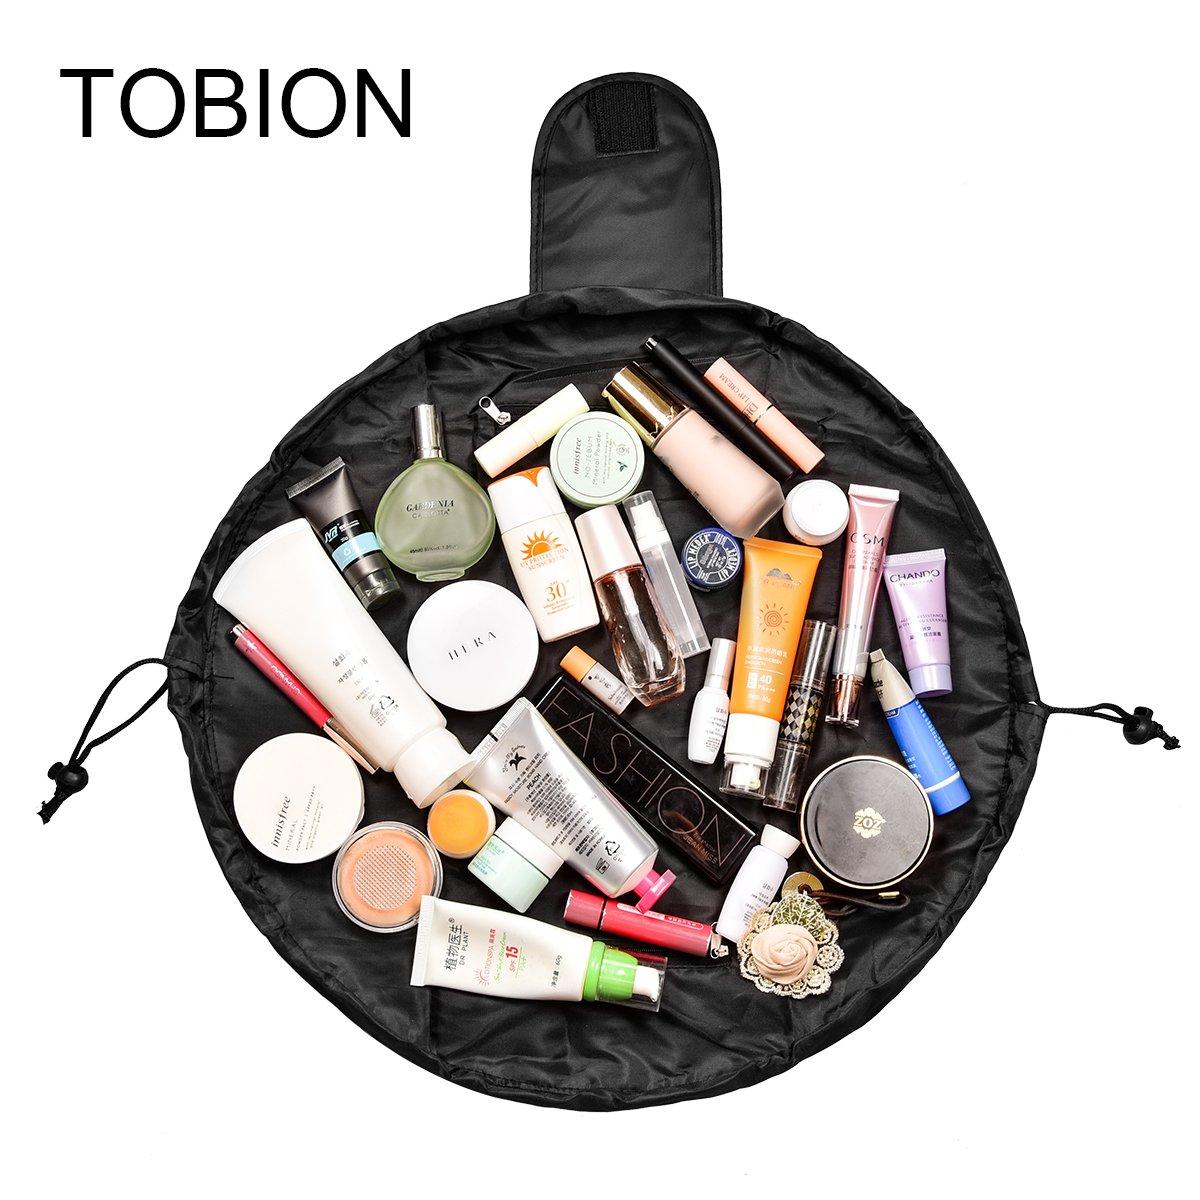 Lazy Portable Makeup Bag Large Capacity Waterproof Drawstring Cosmetic Bag Travel Makeup Pouch Magic Toiletry Bag Storage Organizer for Women&Girls (Black)